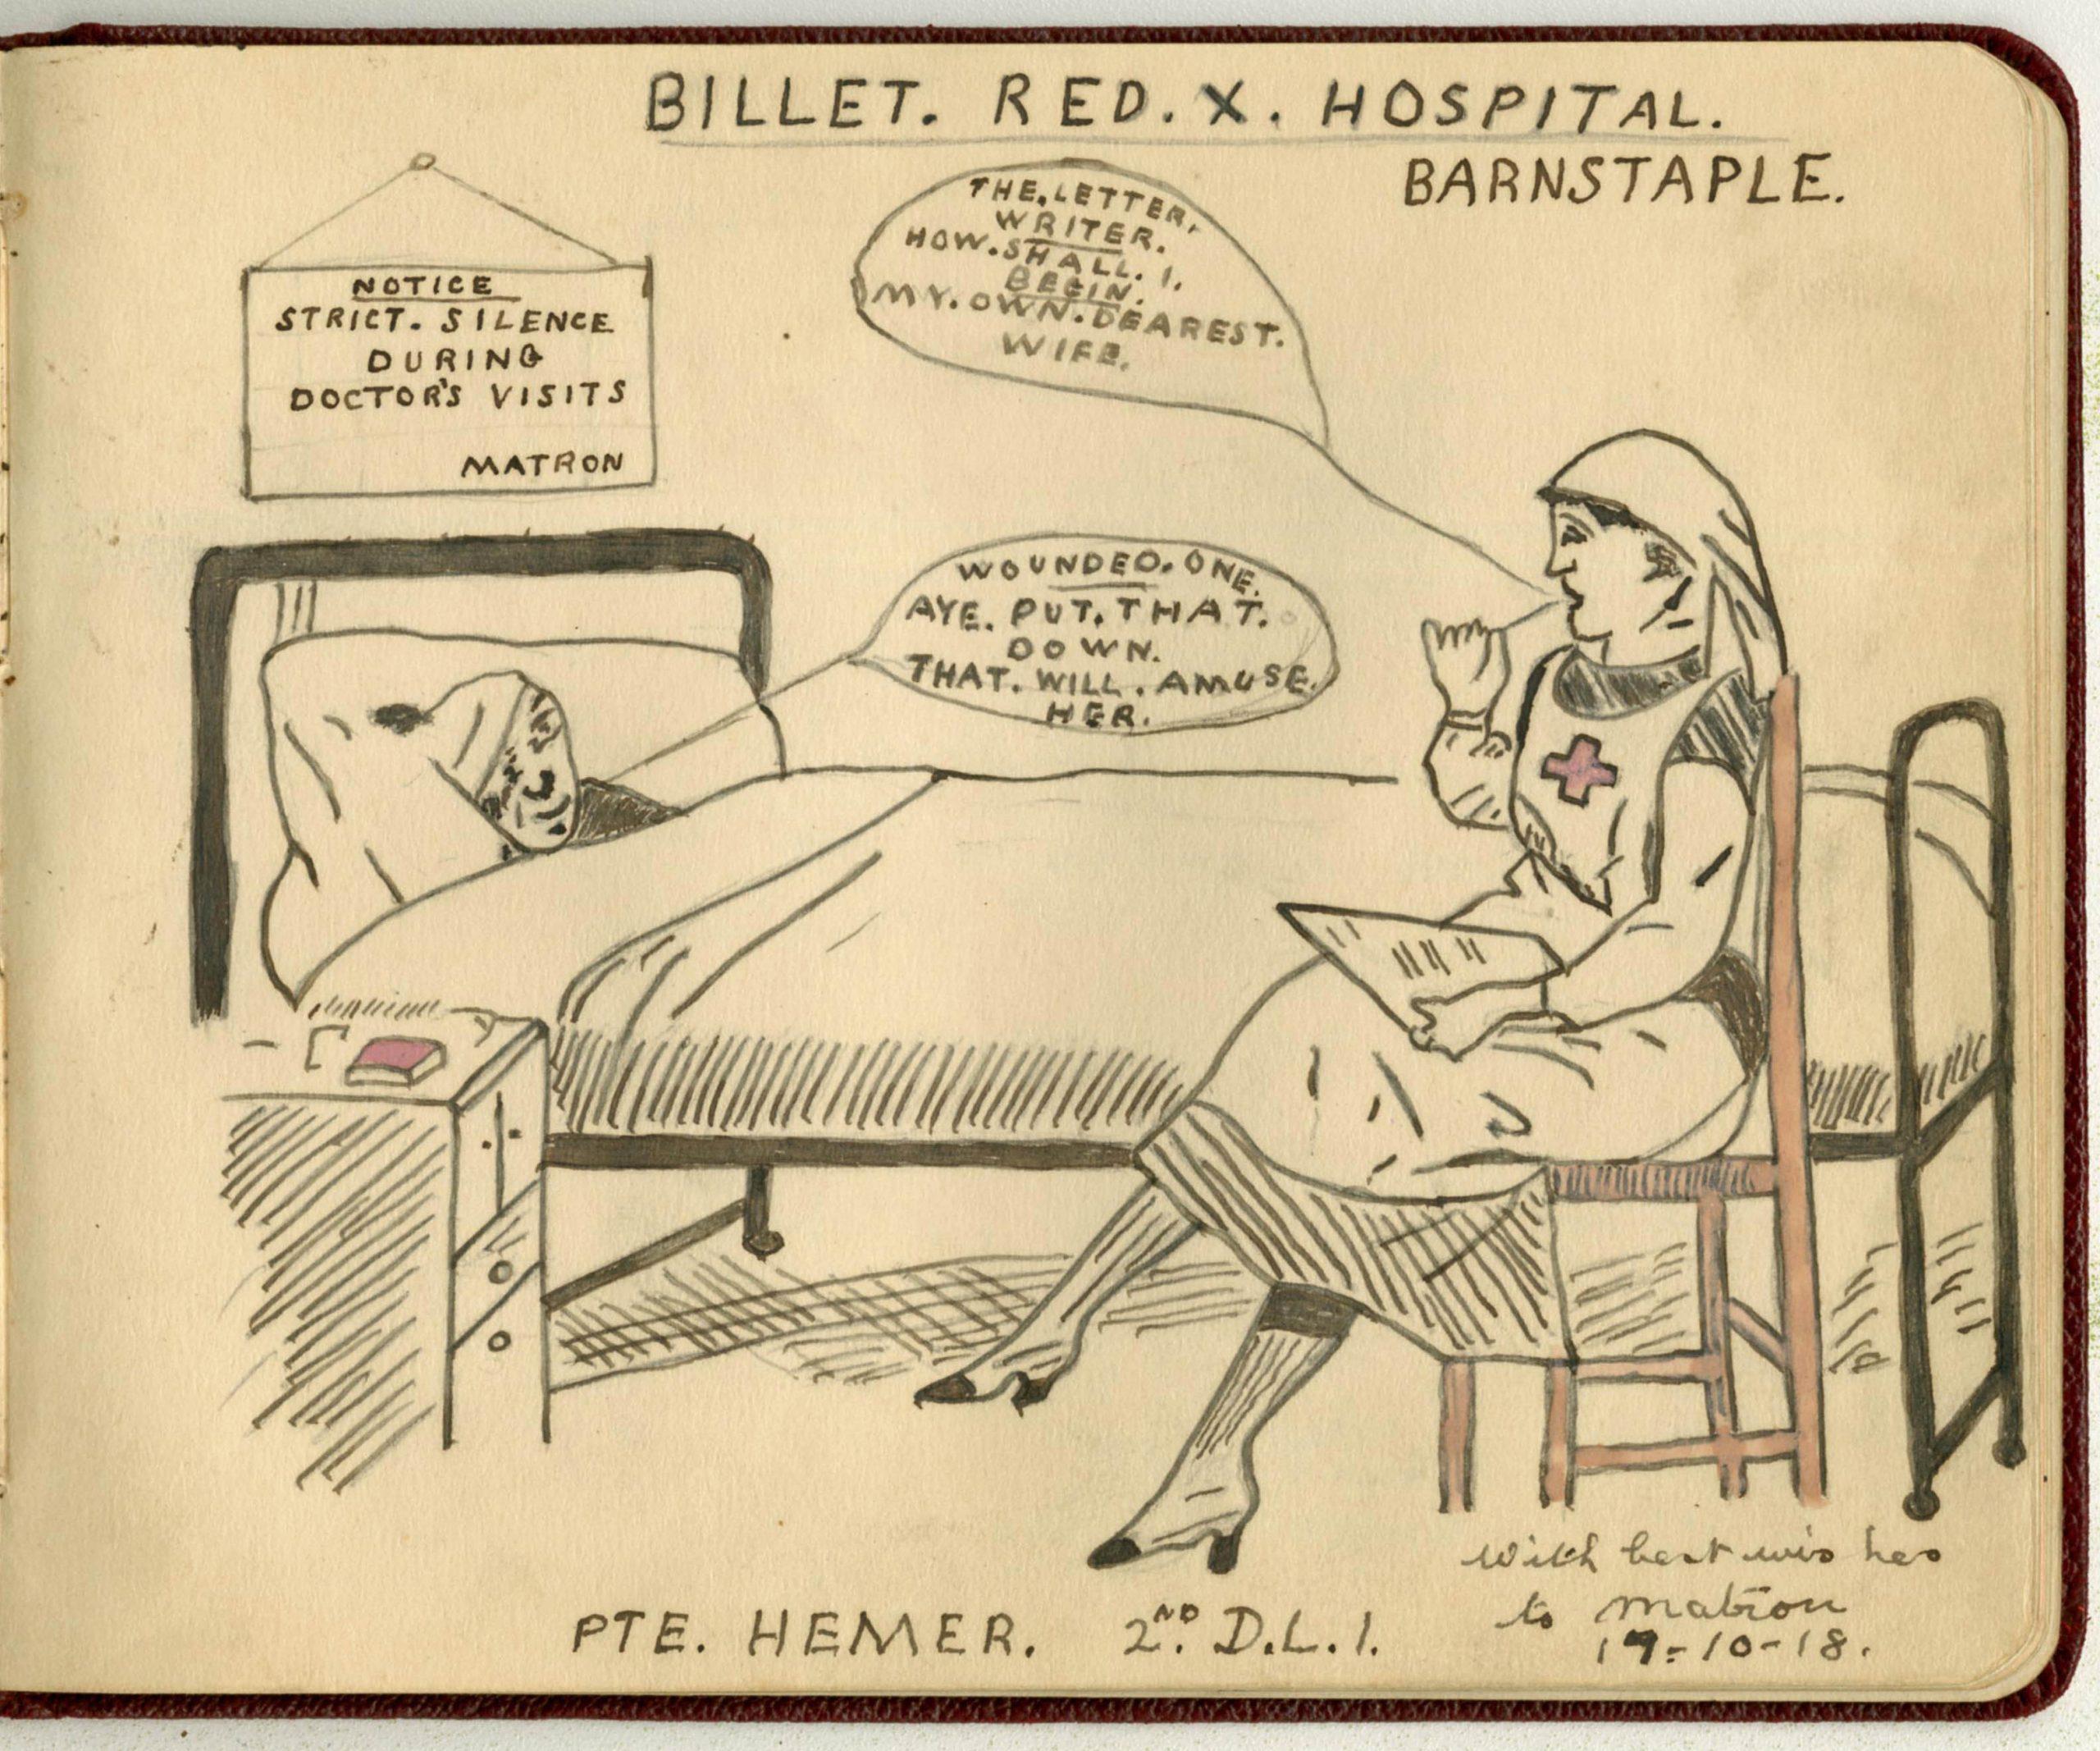 Best Wishes To Matron: Jane Appleton's WW1 autograph book.